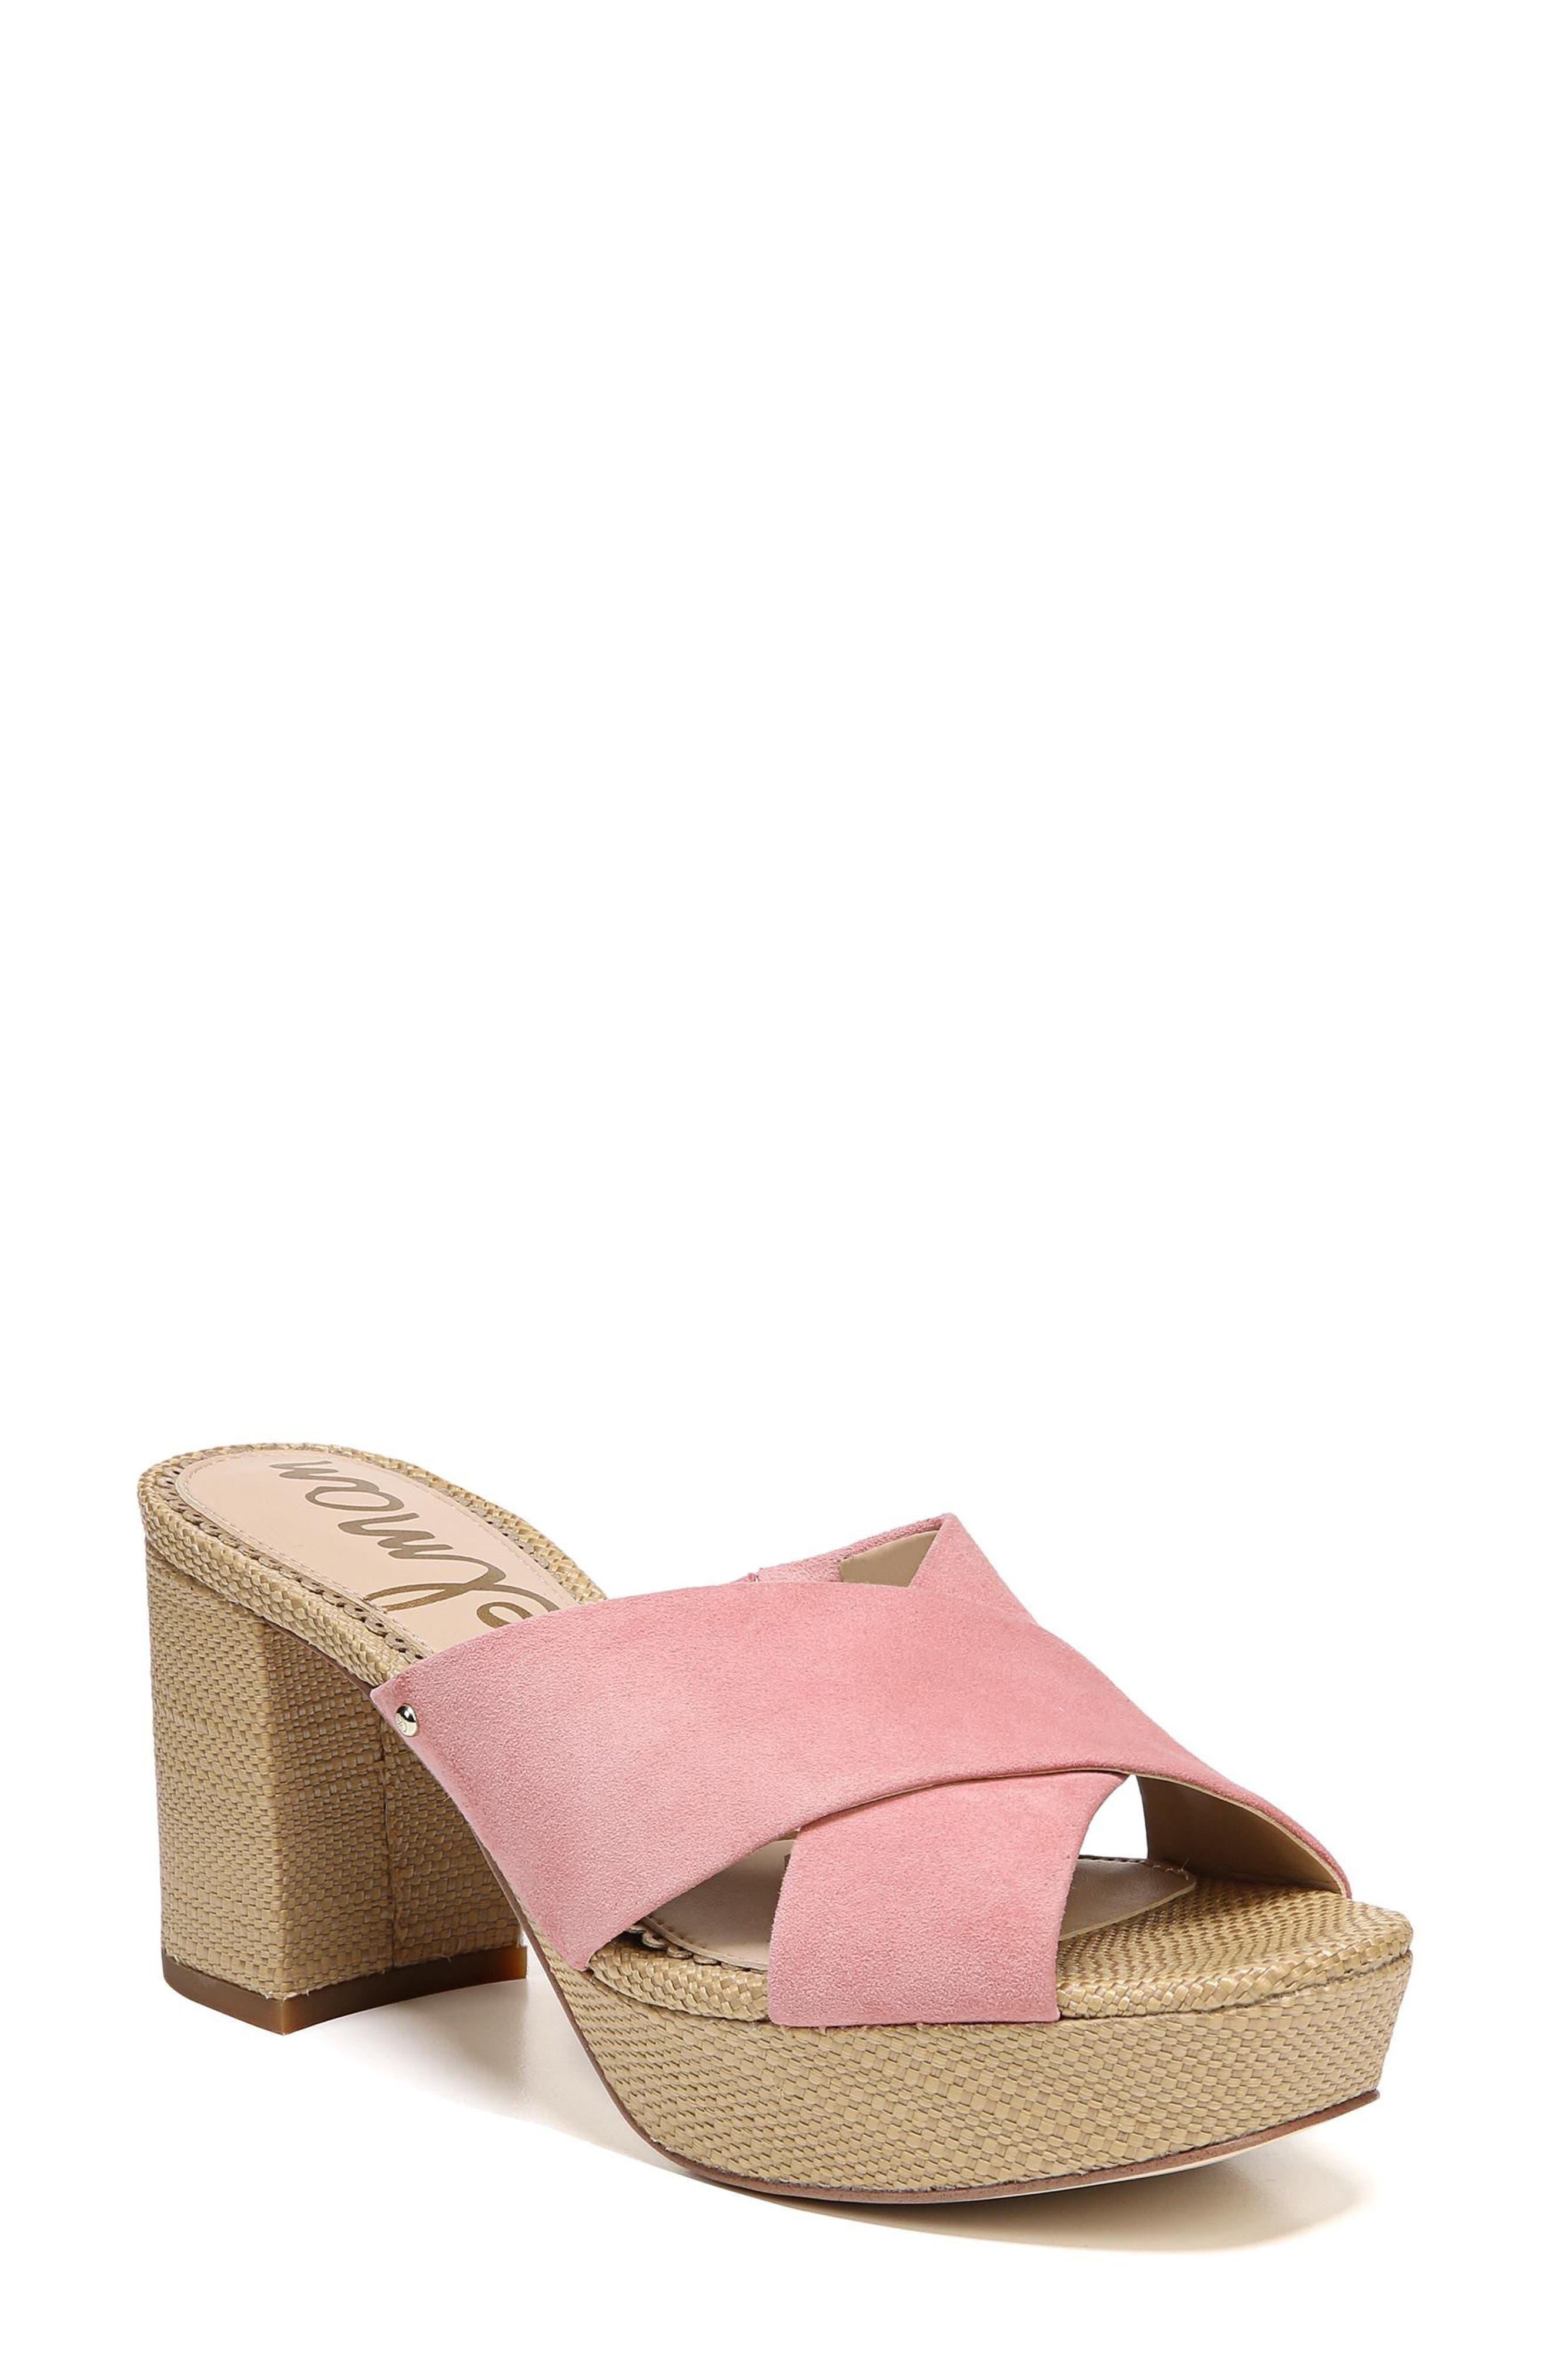 434b800c8ce Sam Edelman Women S Jayne Suede Platform High-Heel Slide Sandals In ...